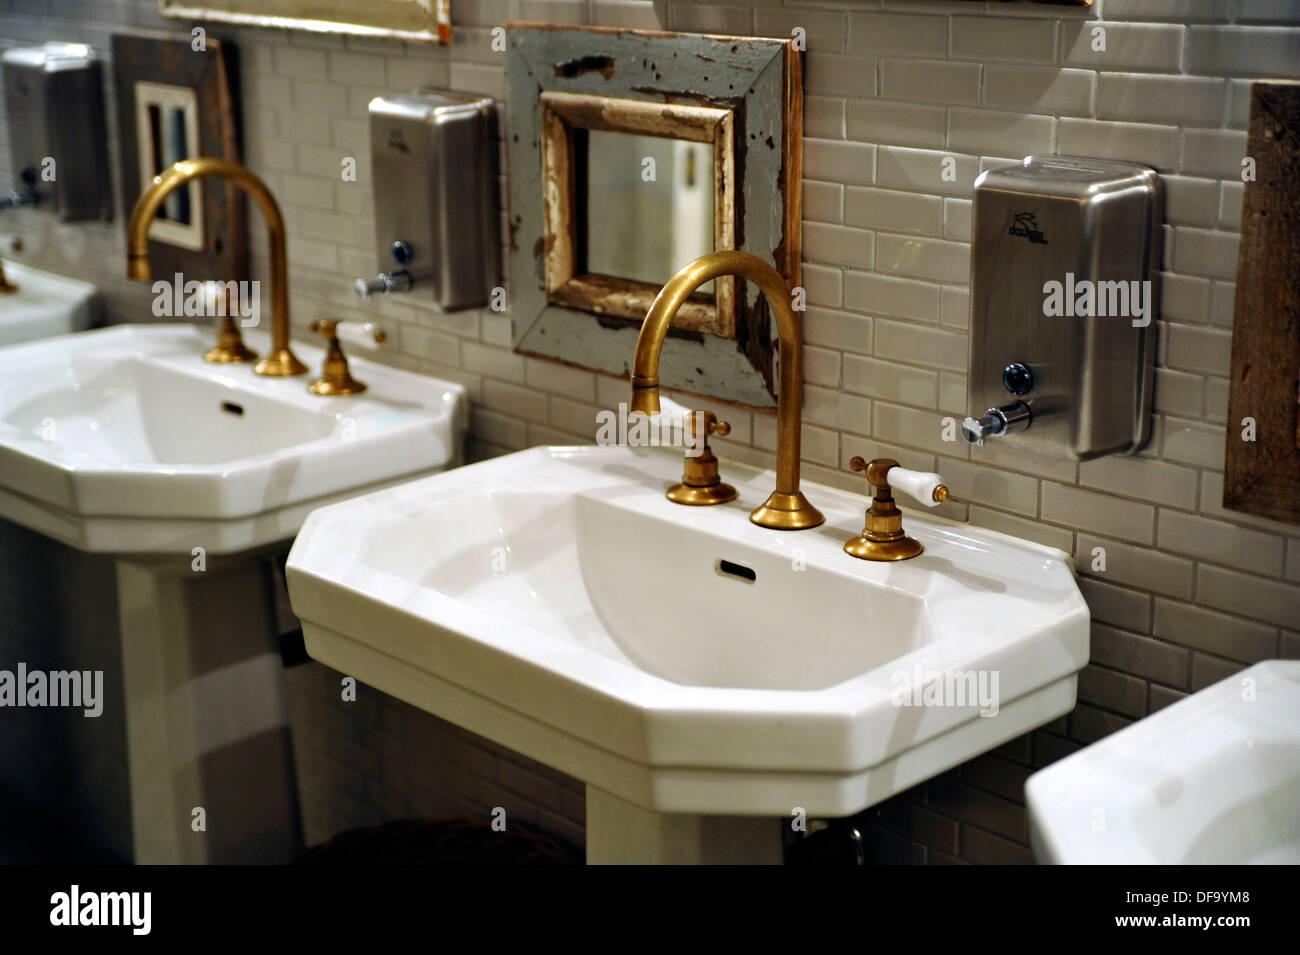 Pedestal Sinks - Stock Image